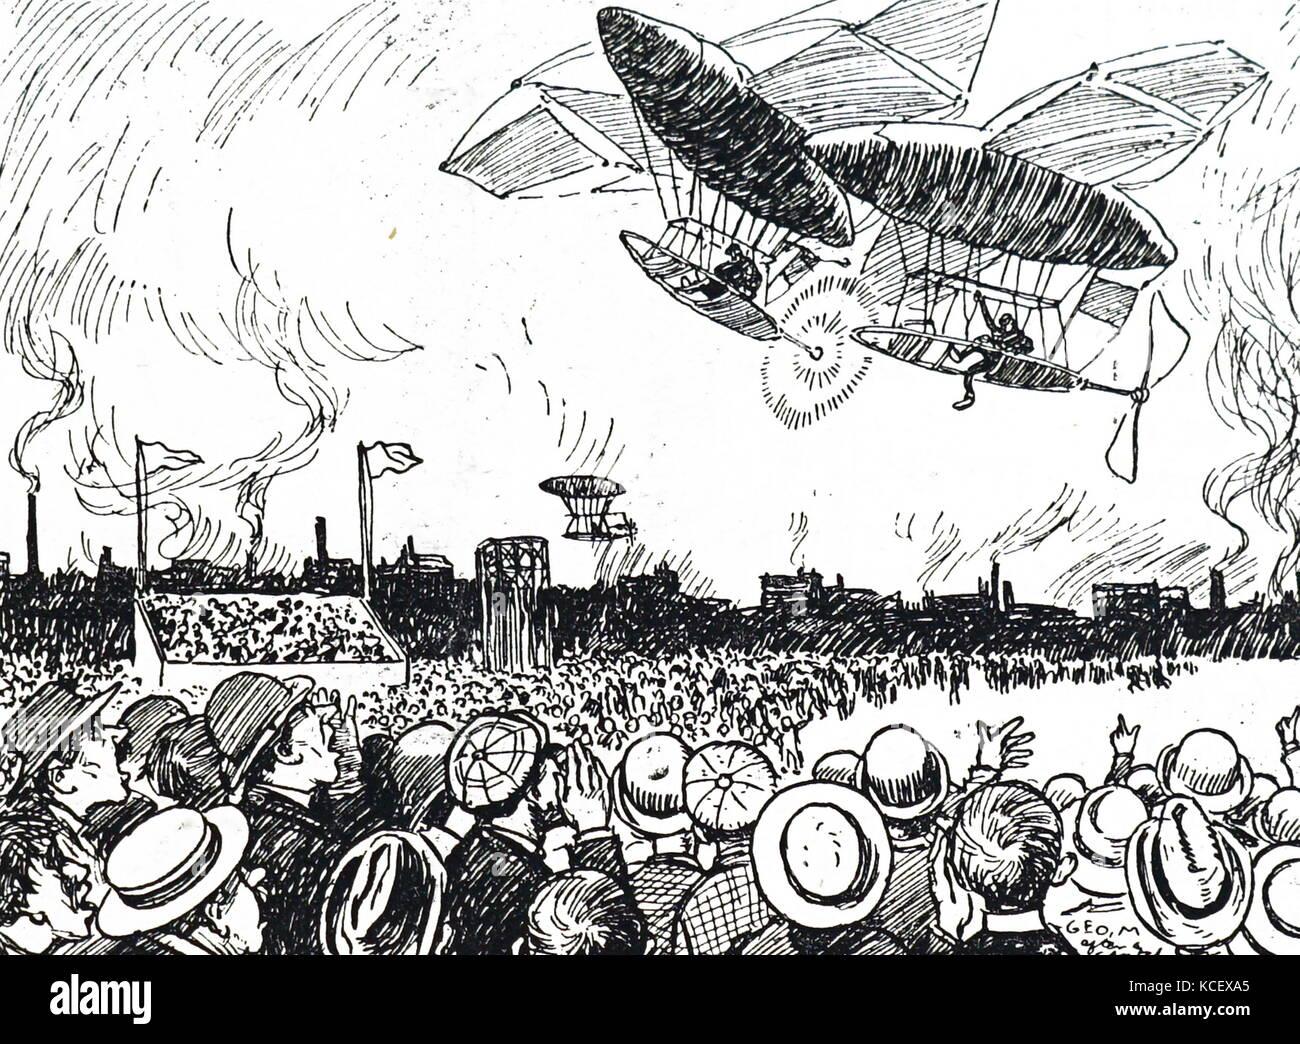 Caricatura horrorizados espectadores viendo colisionan dos aviones durante un aire-show. Fecha Siglo XX Foto de stock